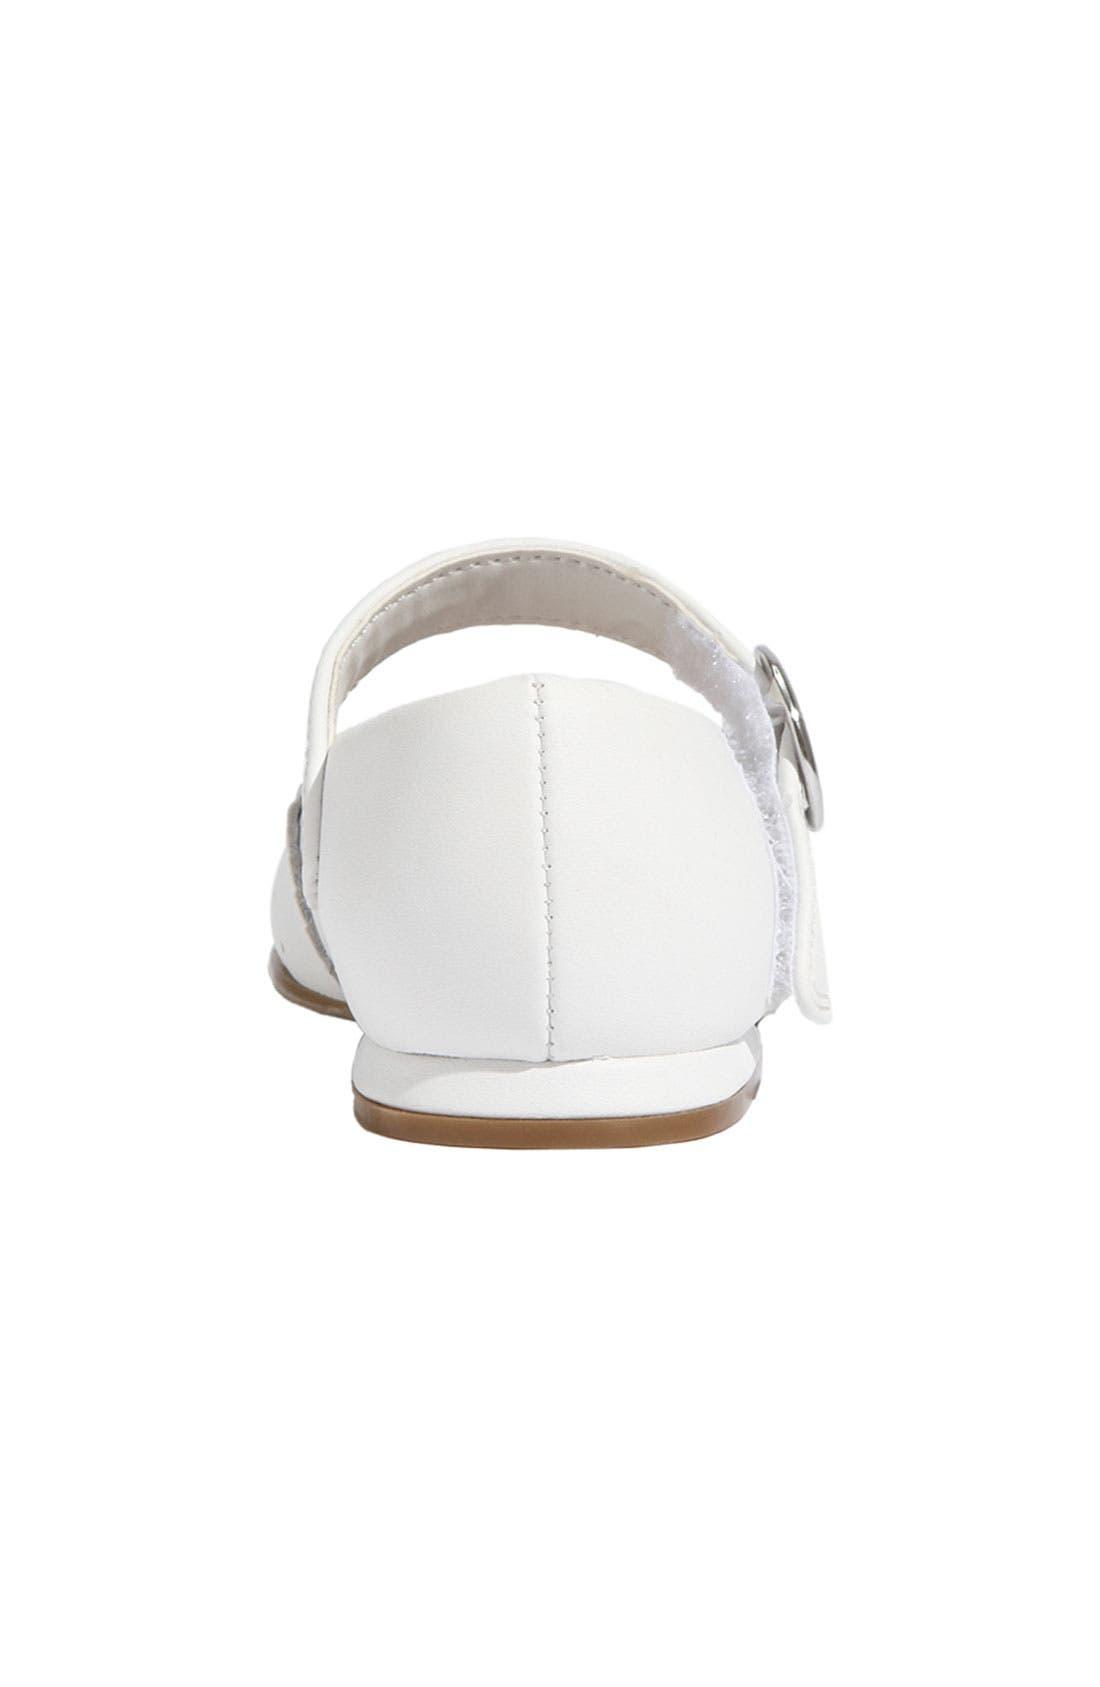 STRIDE RITE,                             'Camila' Mary Jane,                             Alternate thumbnail 2, color,                             White Leather